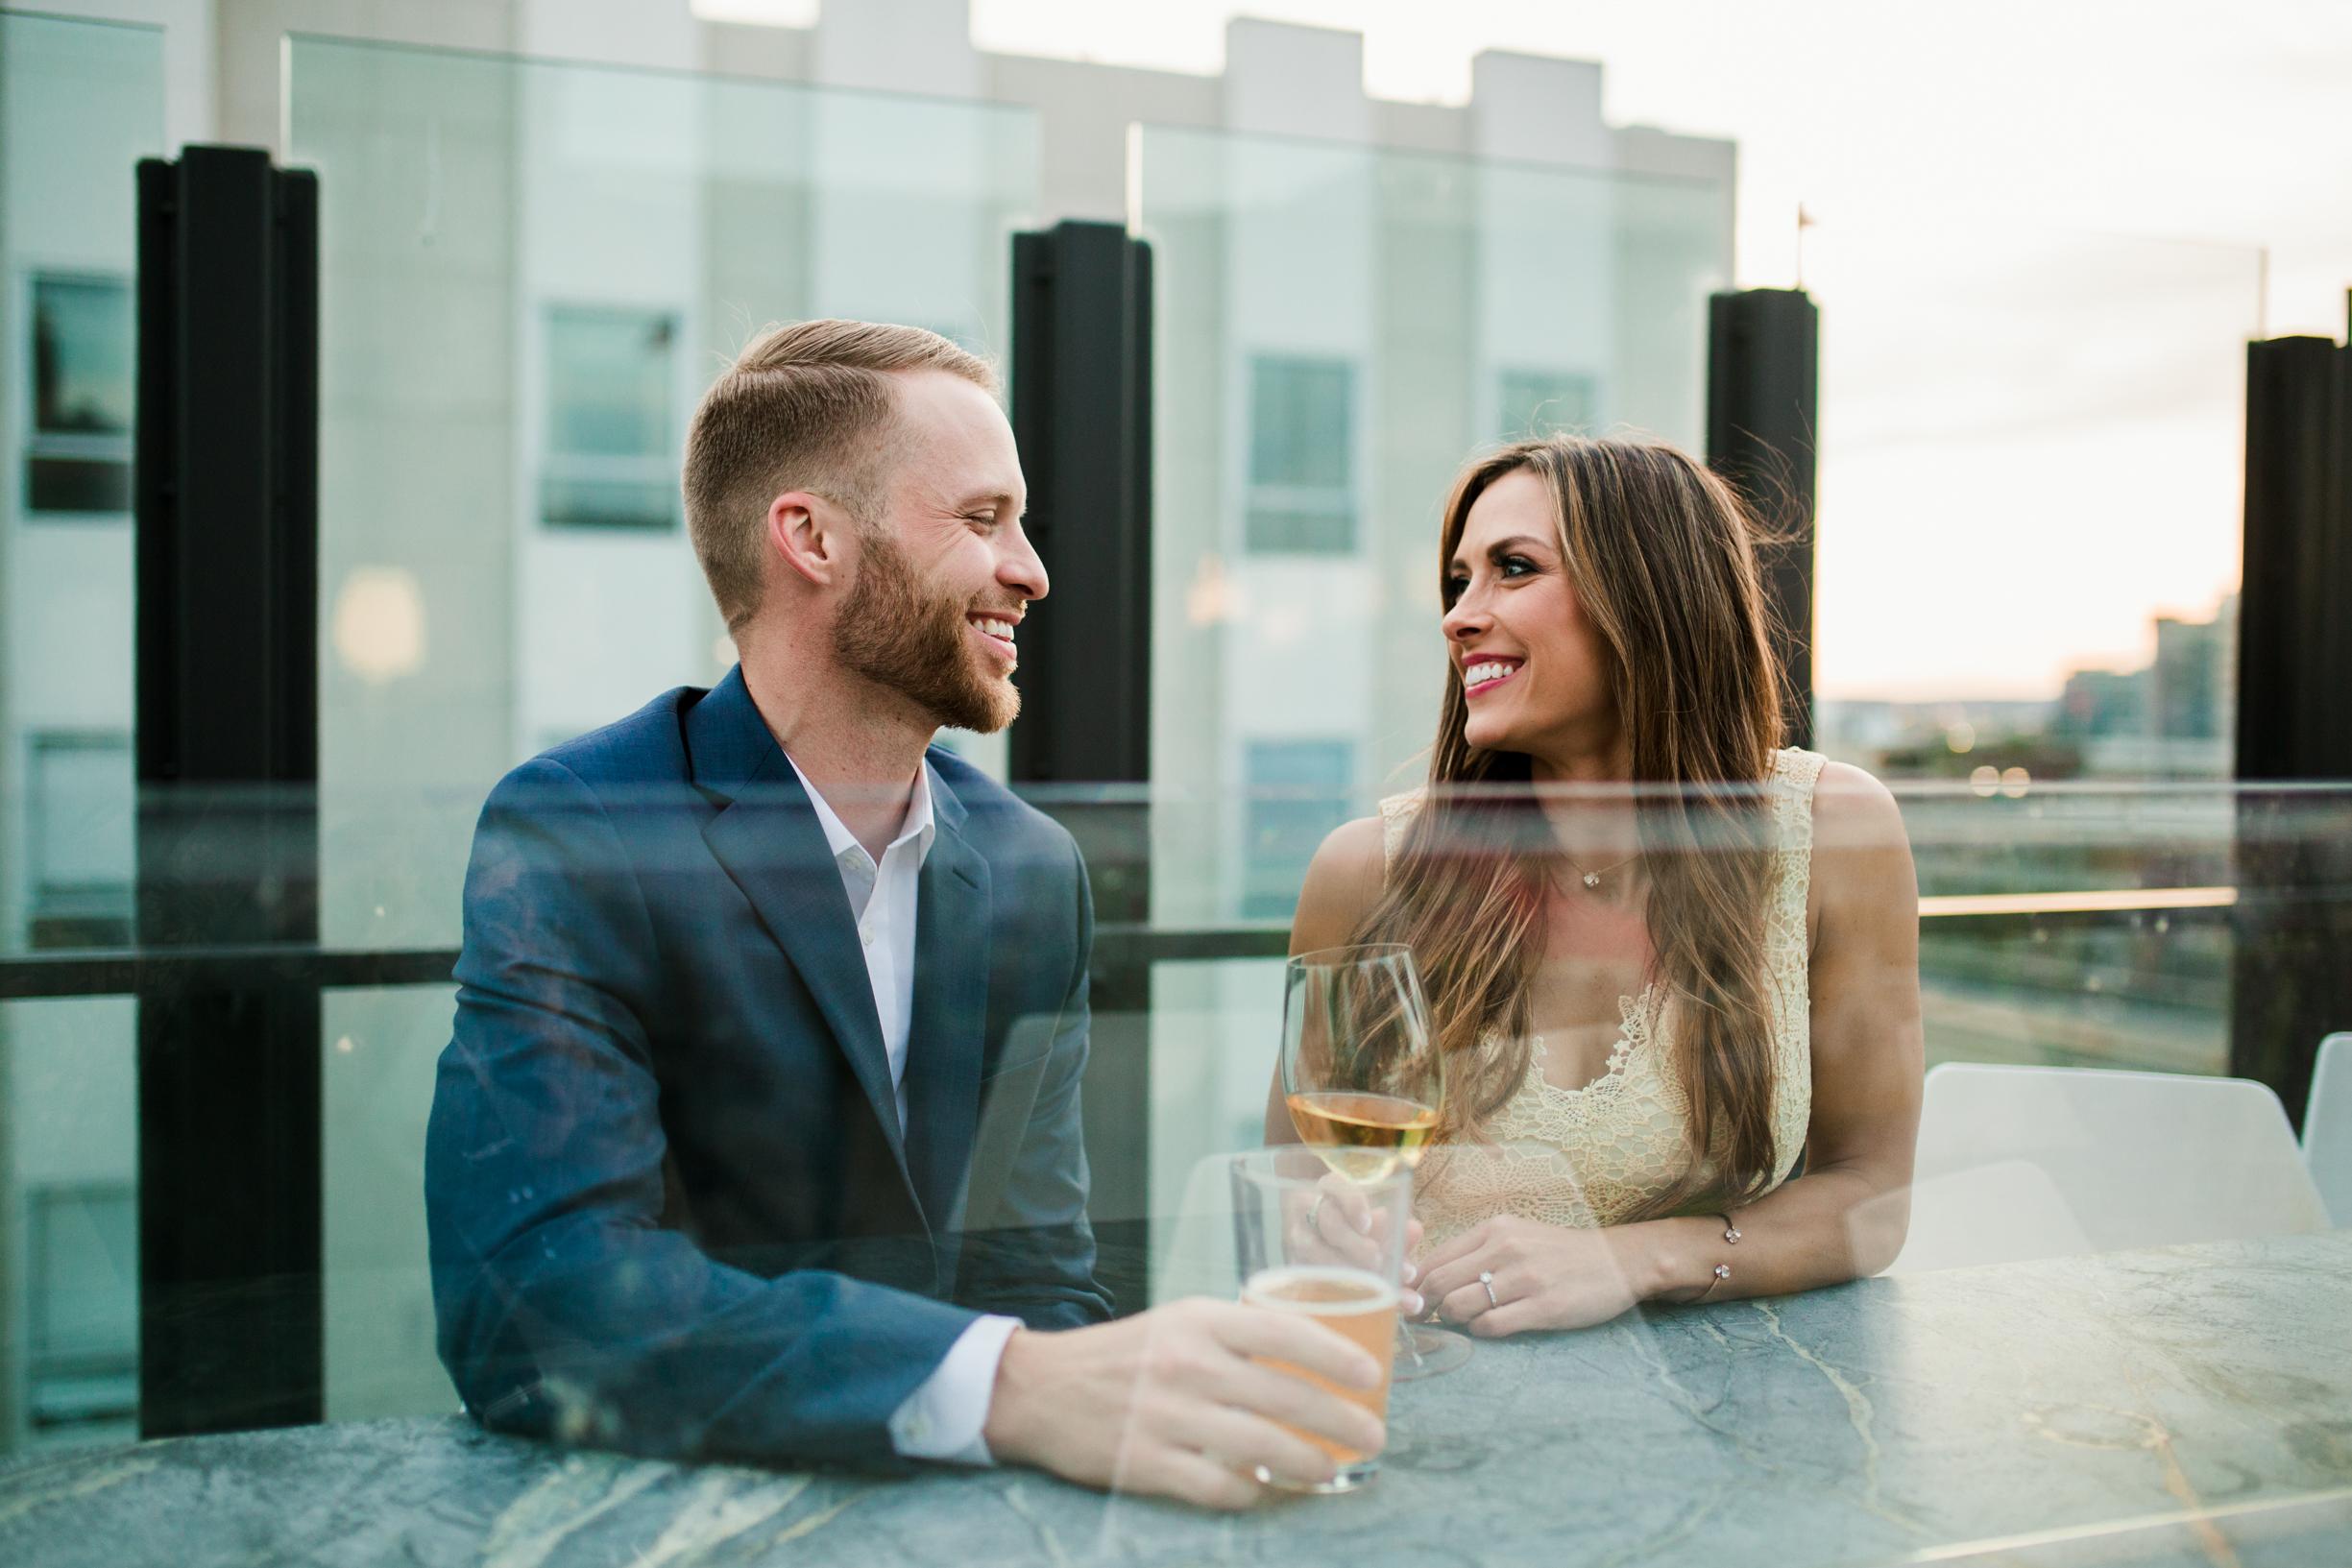 Victoria & Chad Engagement 2018 Crystal Ludwick Photo Louisville Kentucky Wedding Photographer WEBSITE (26 of 48).jpg